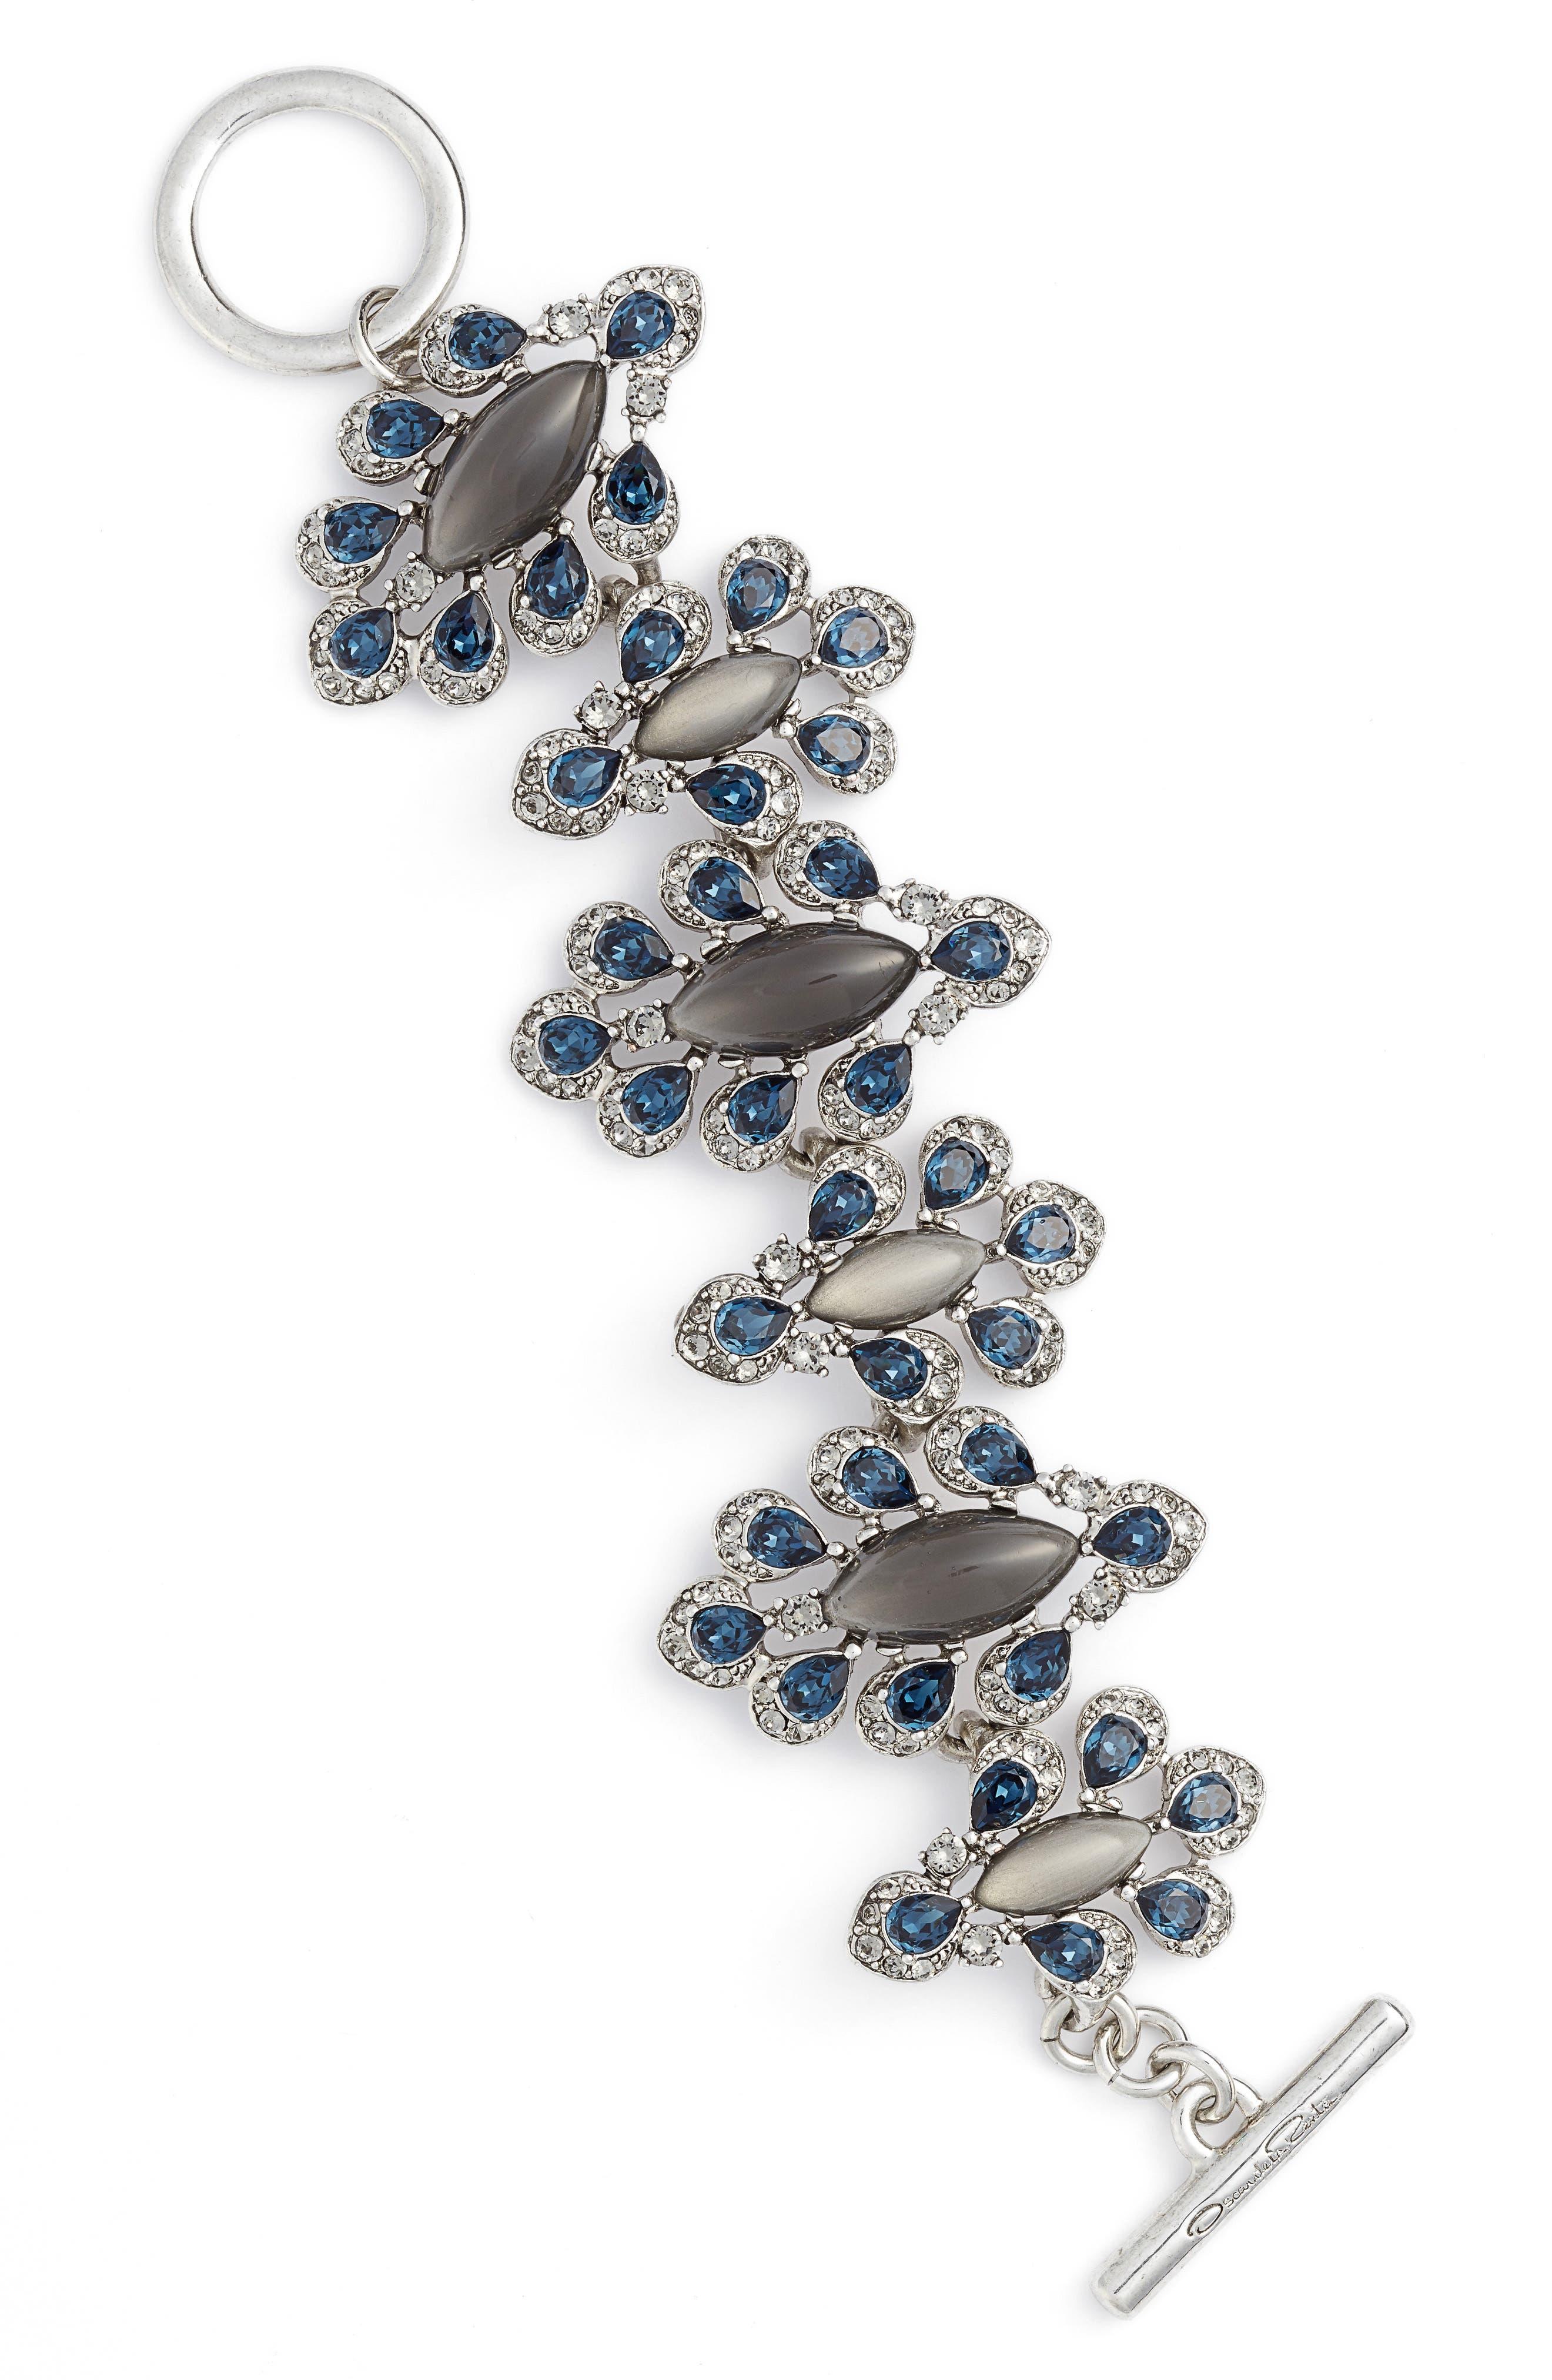 Oscar de la Renta Parlor Swarovski Crystal Bracelet